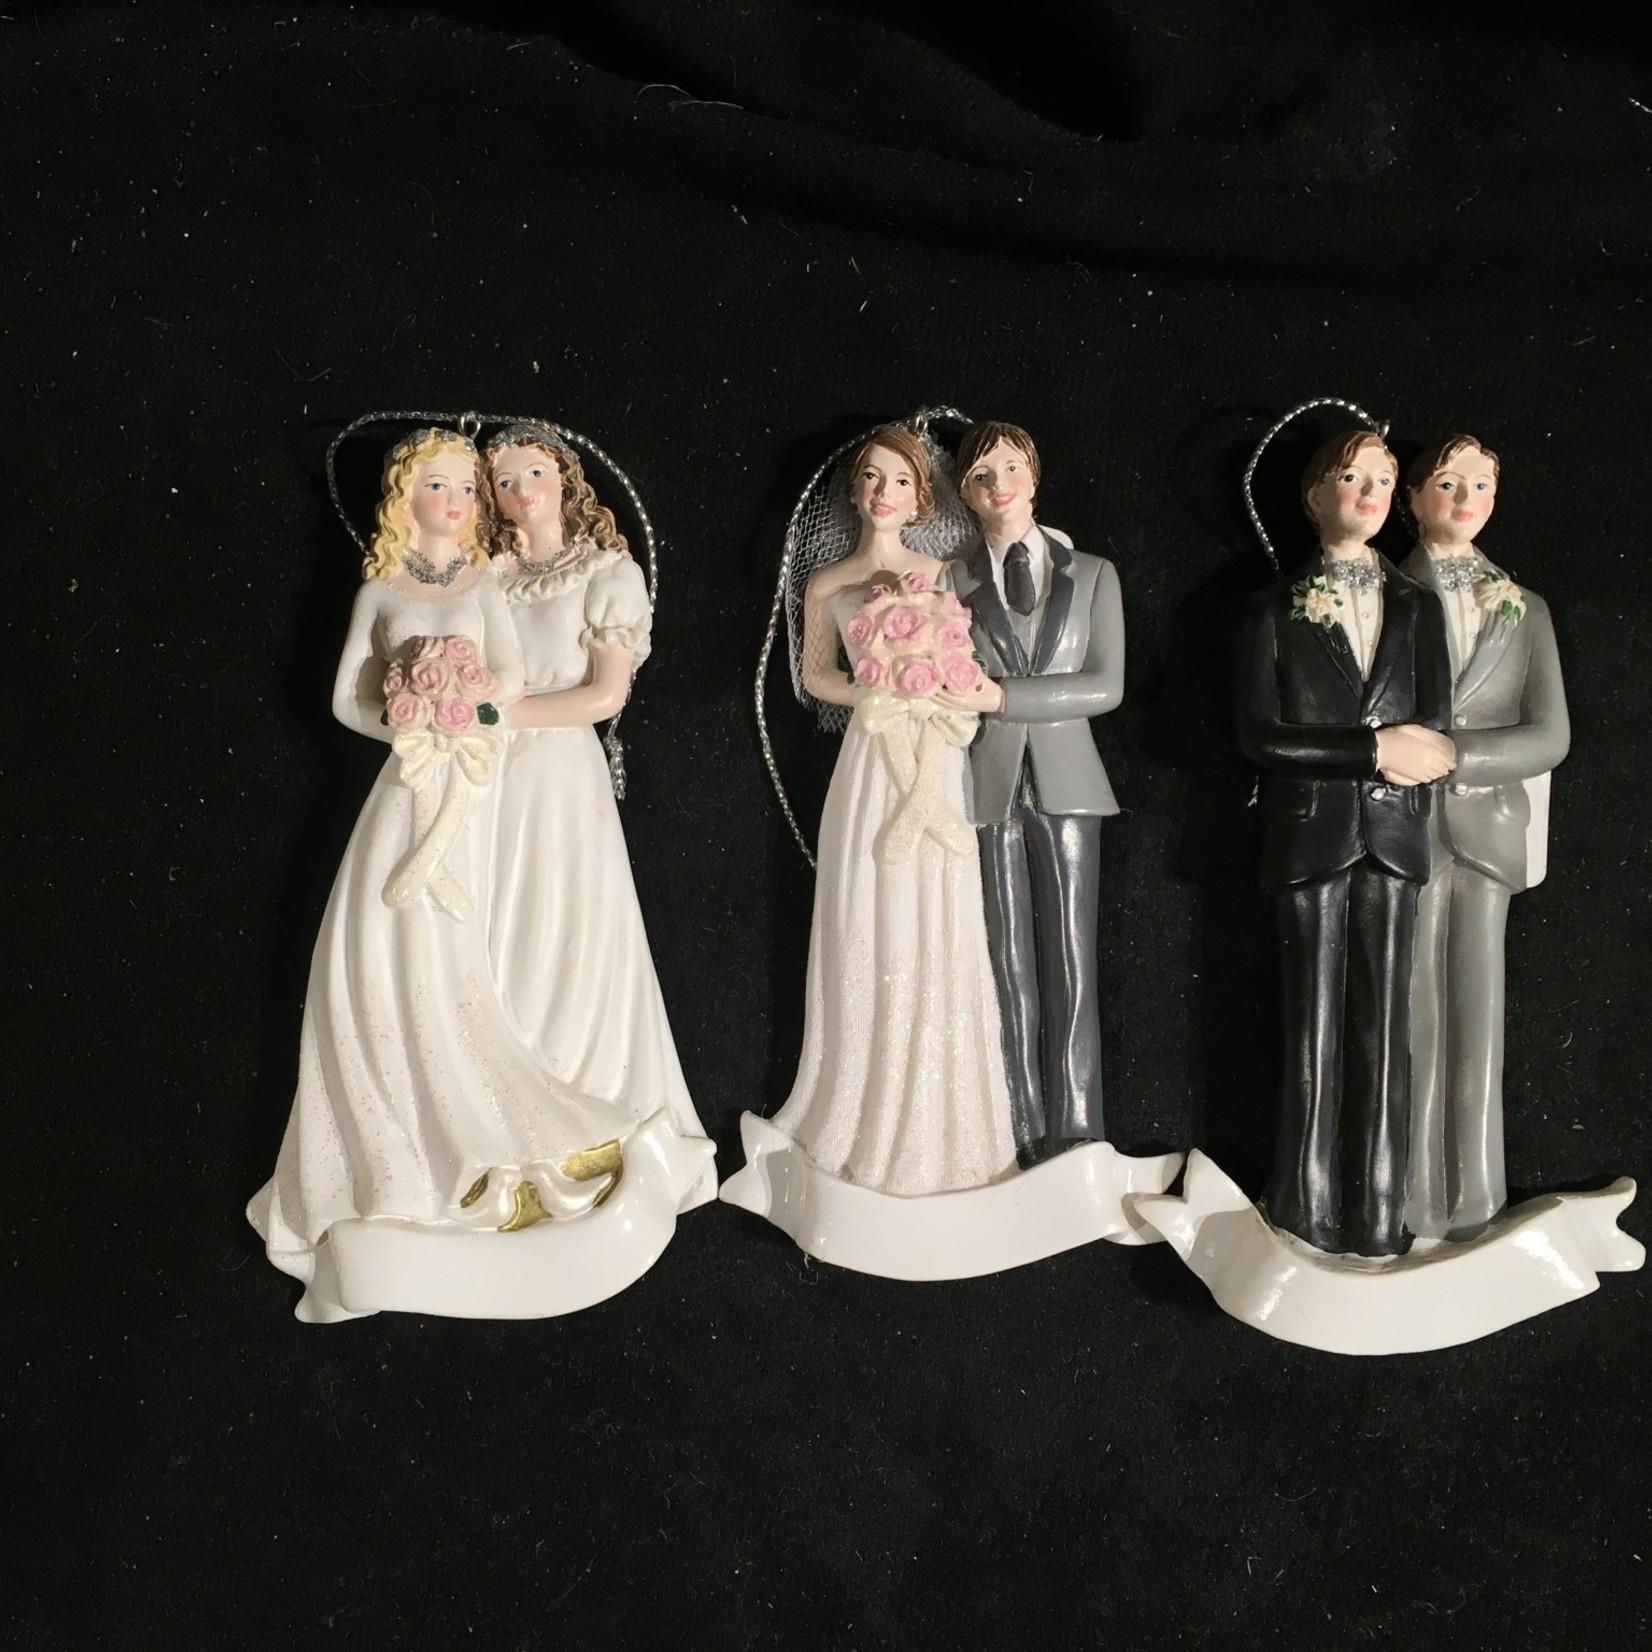 Wedding Couple Orn 3A